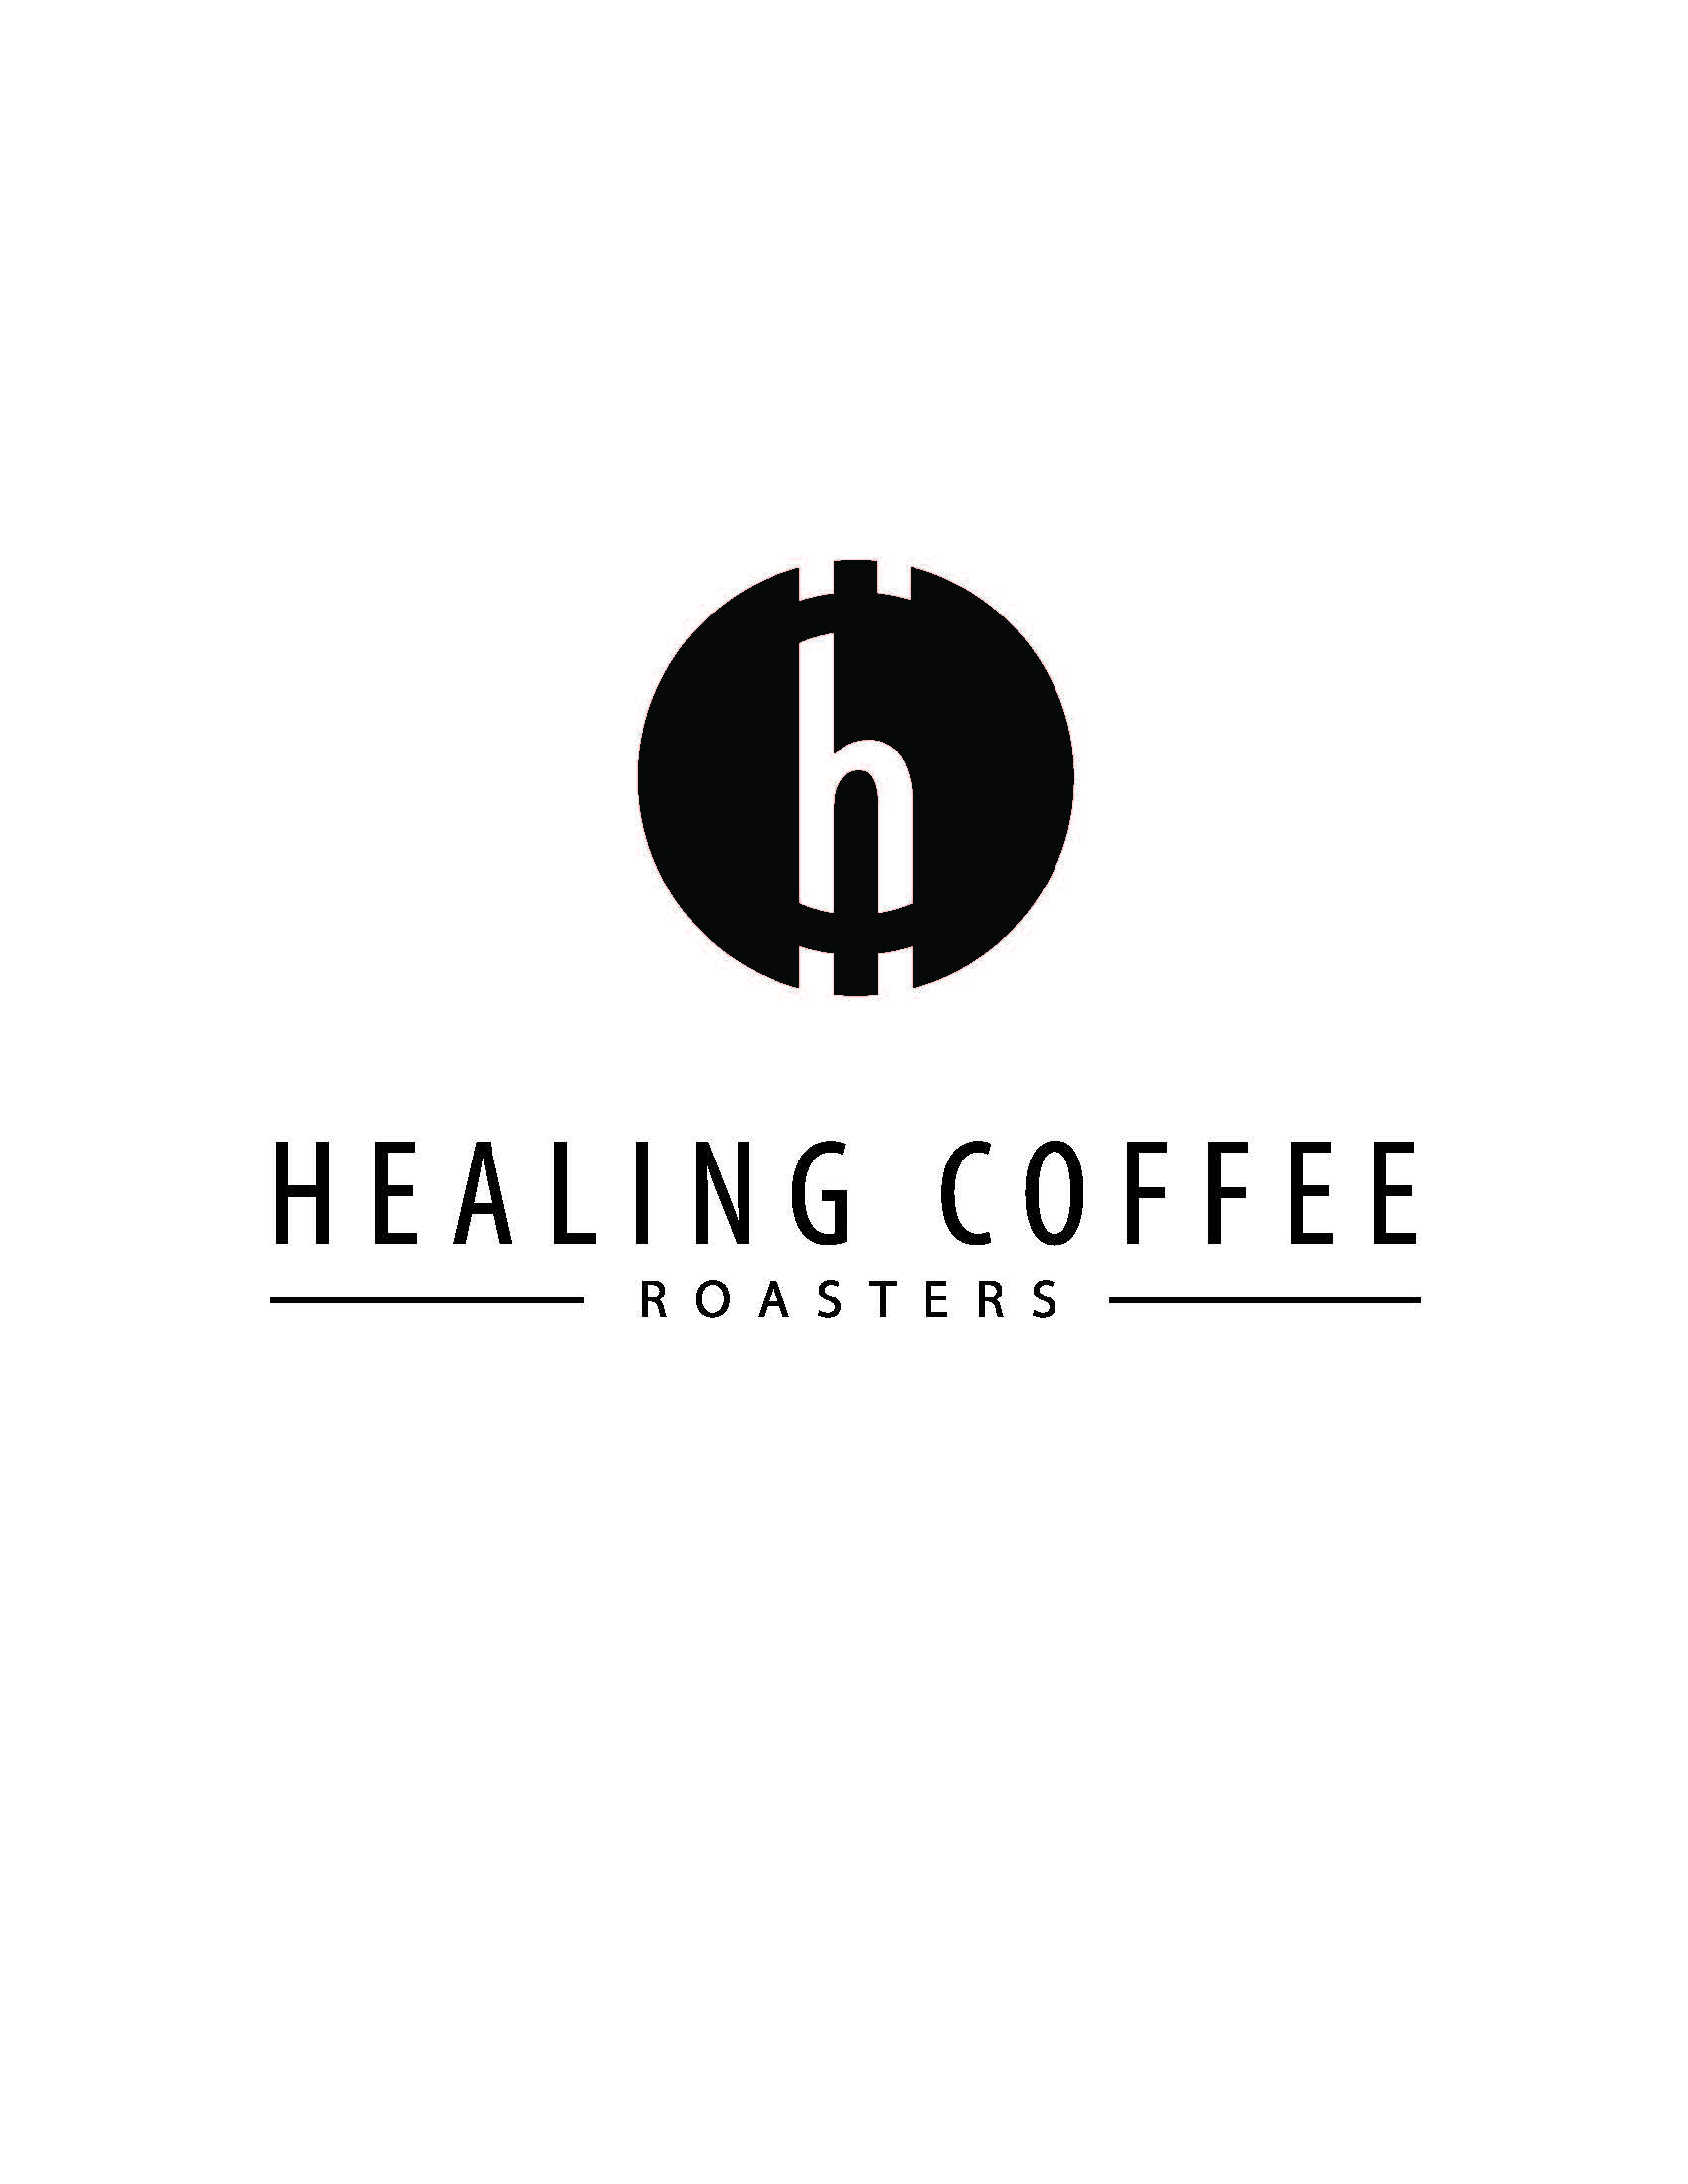 Healing Coffee Roasters Logo Exhibitors